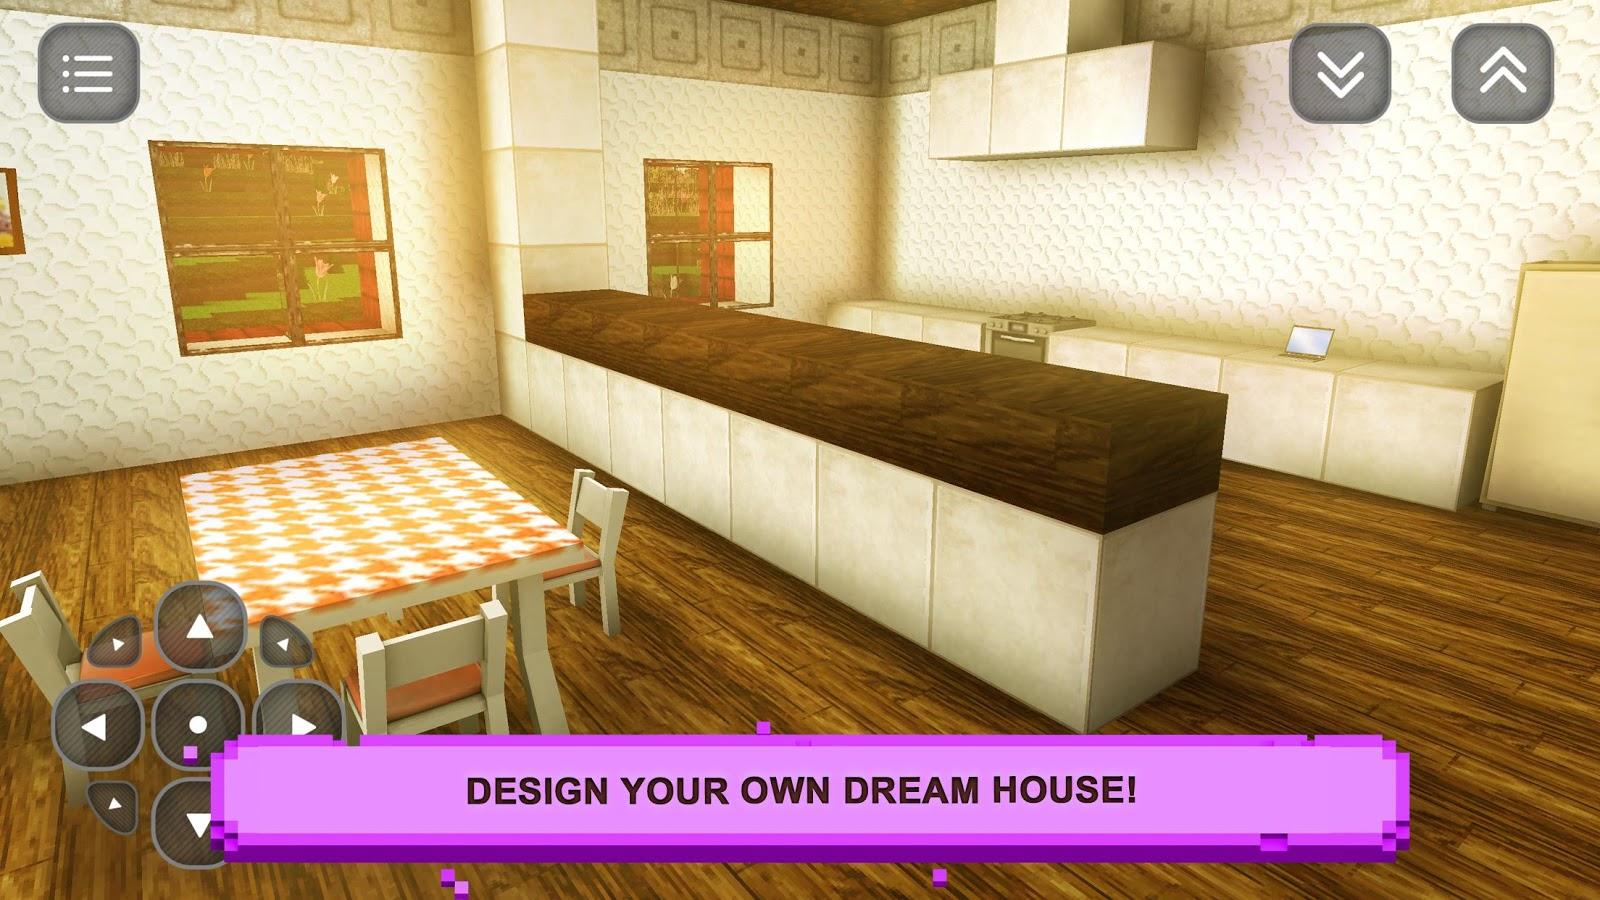 Sim Girls Craft: Home Design 1.13 APK Download - Android ...